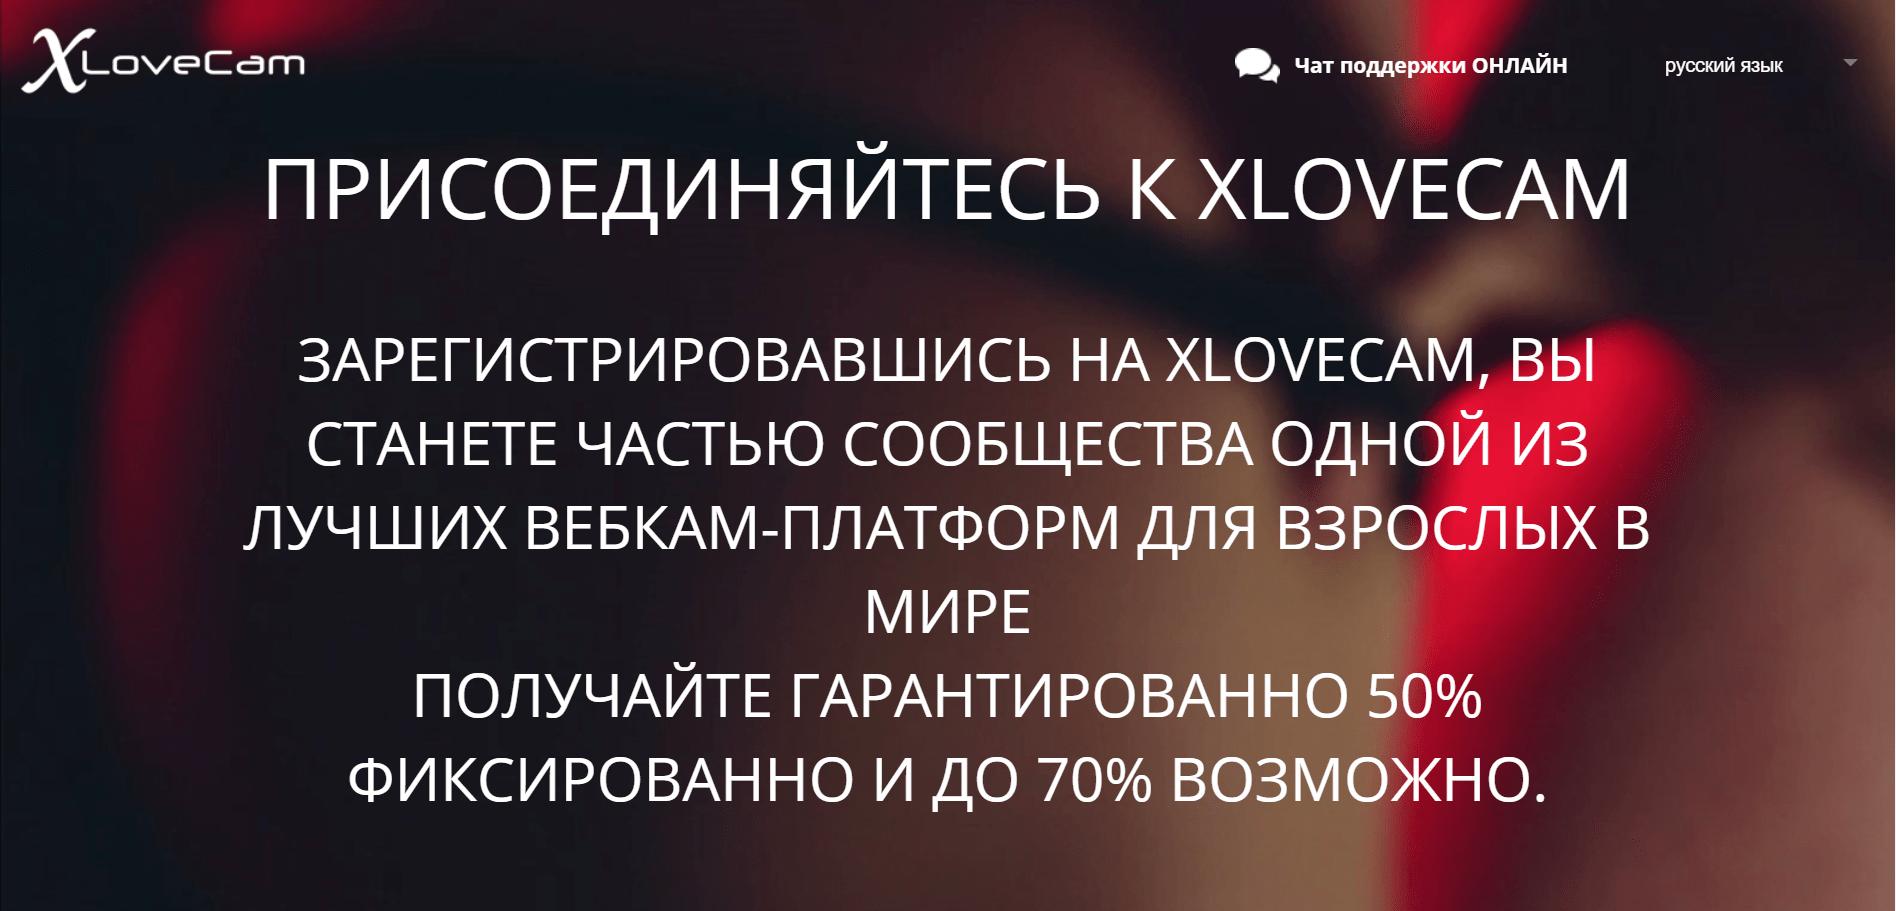 Вебкам сайт XLove